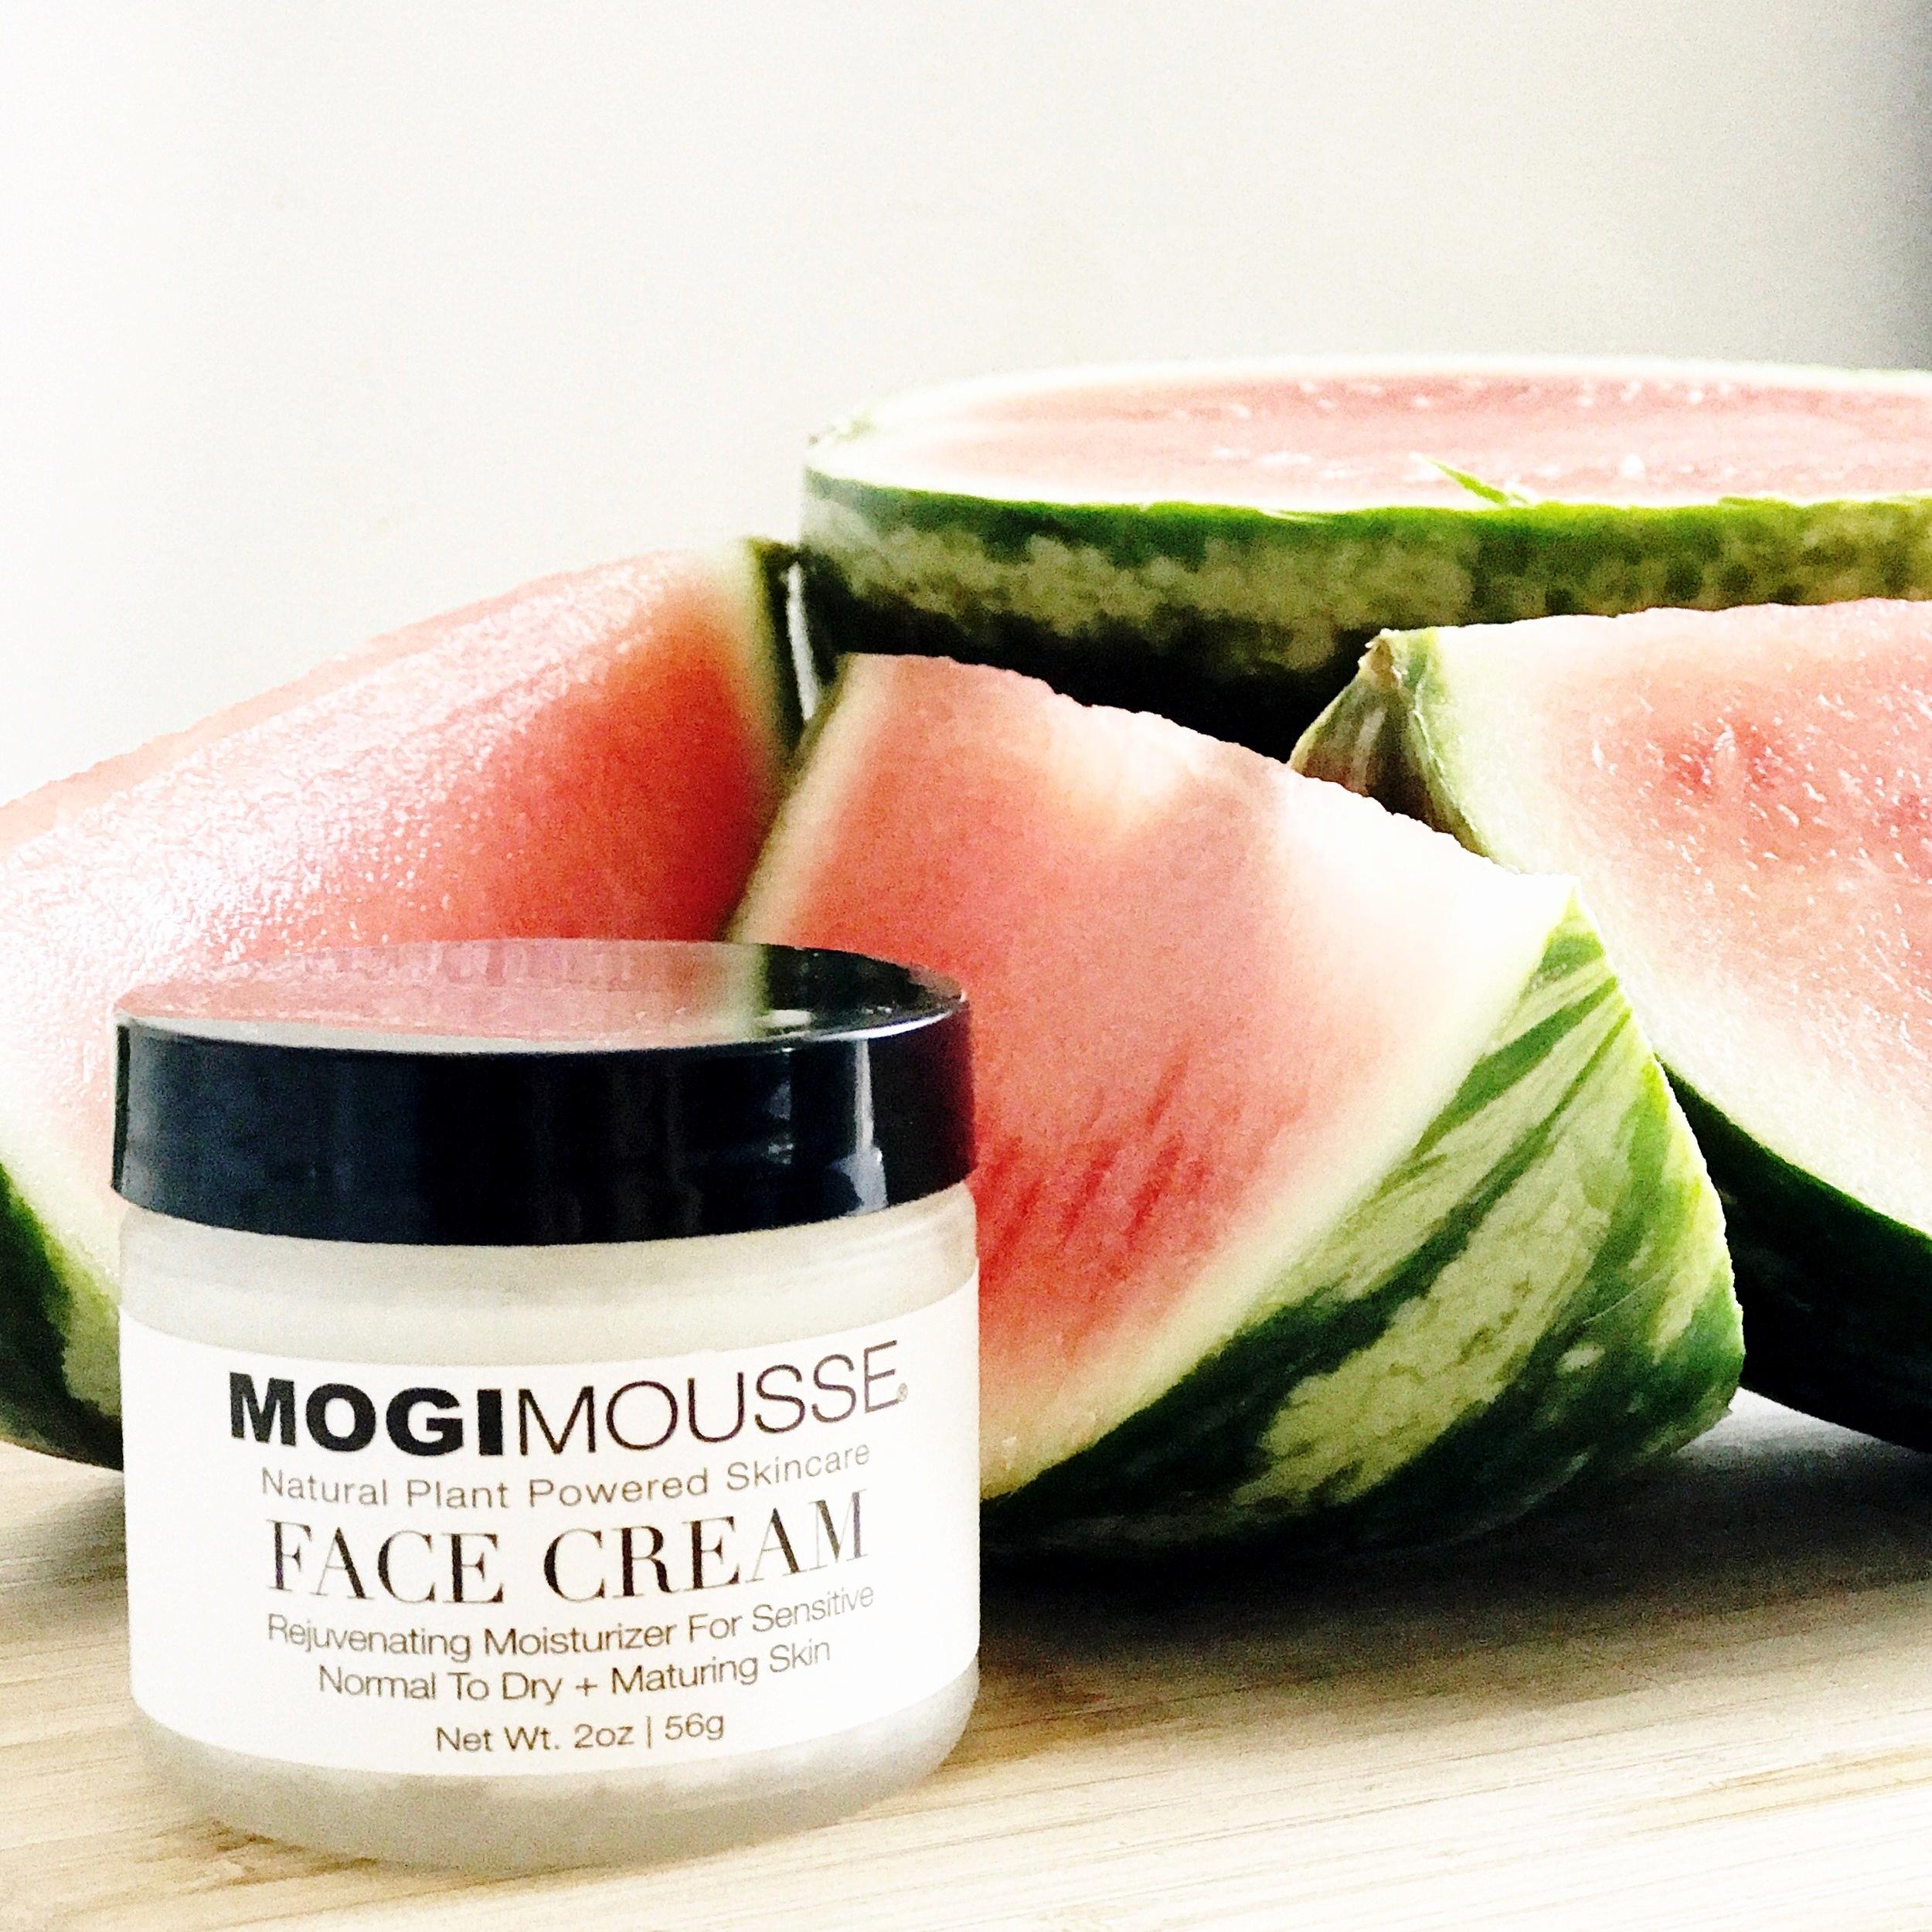 MOG MOUSSE Face Cream